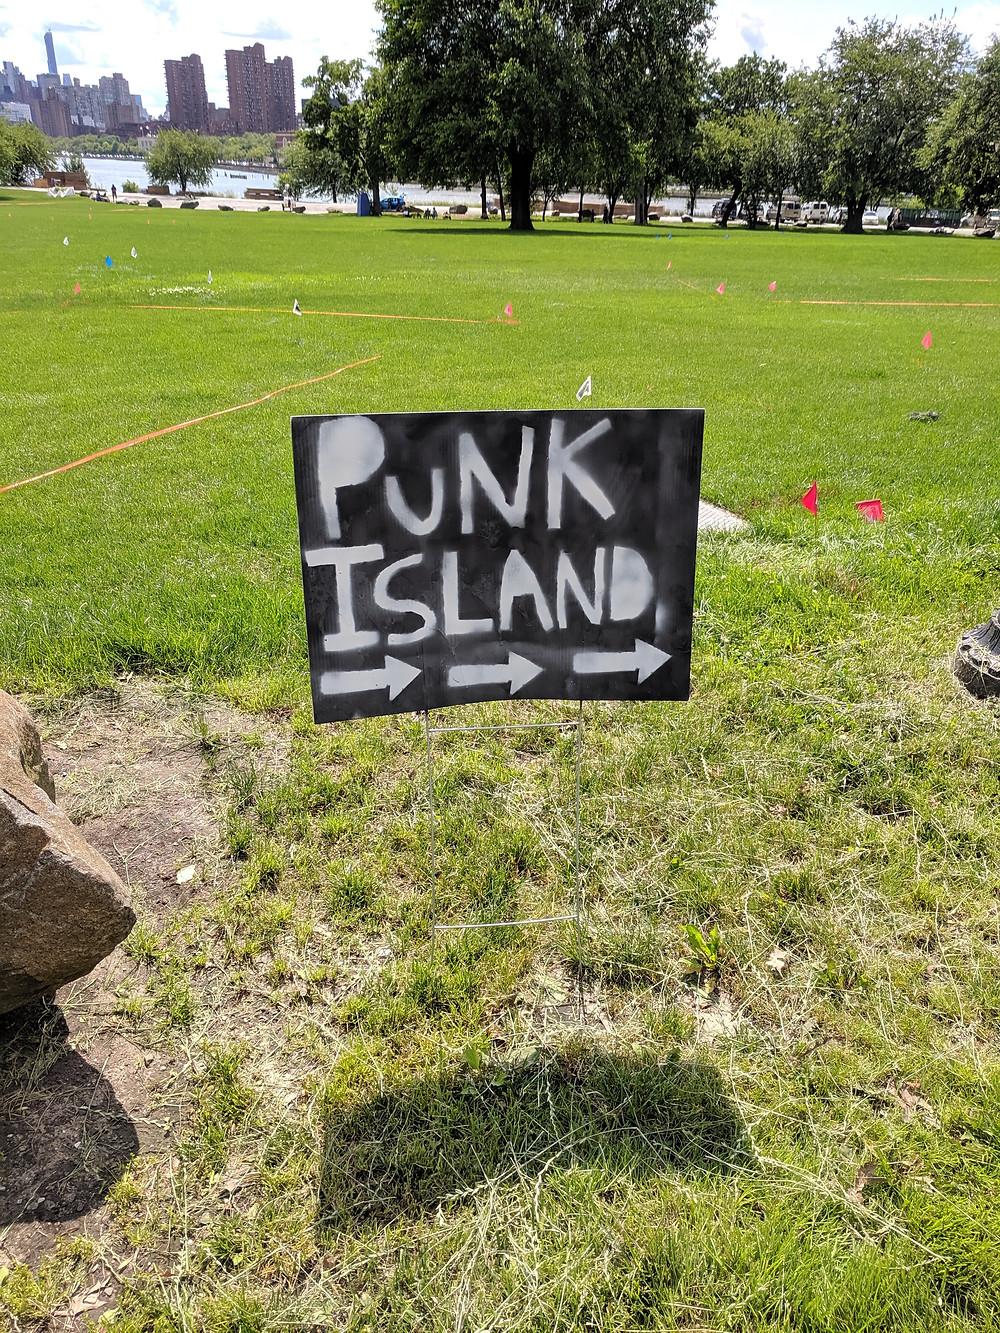 Punk Island 2019